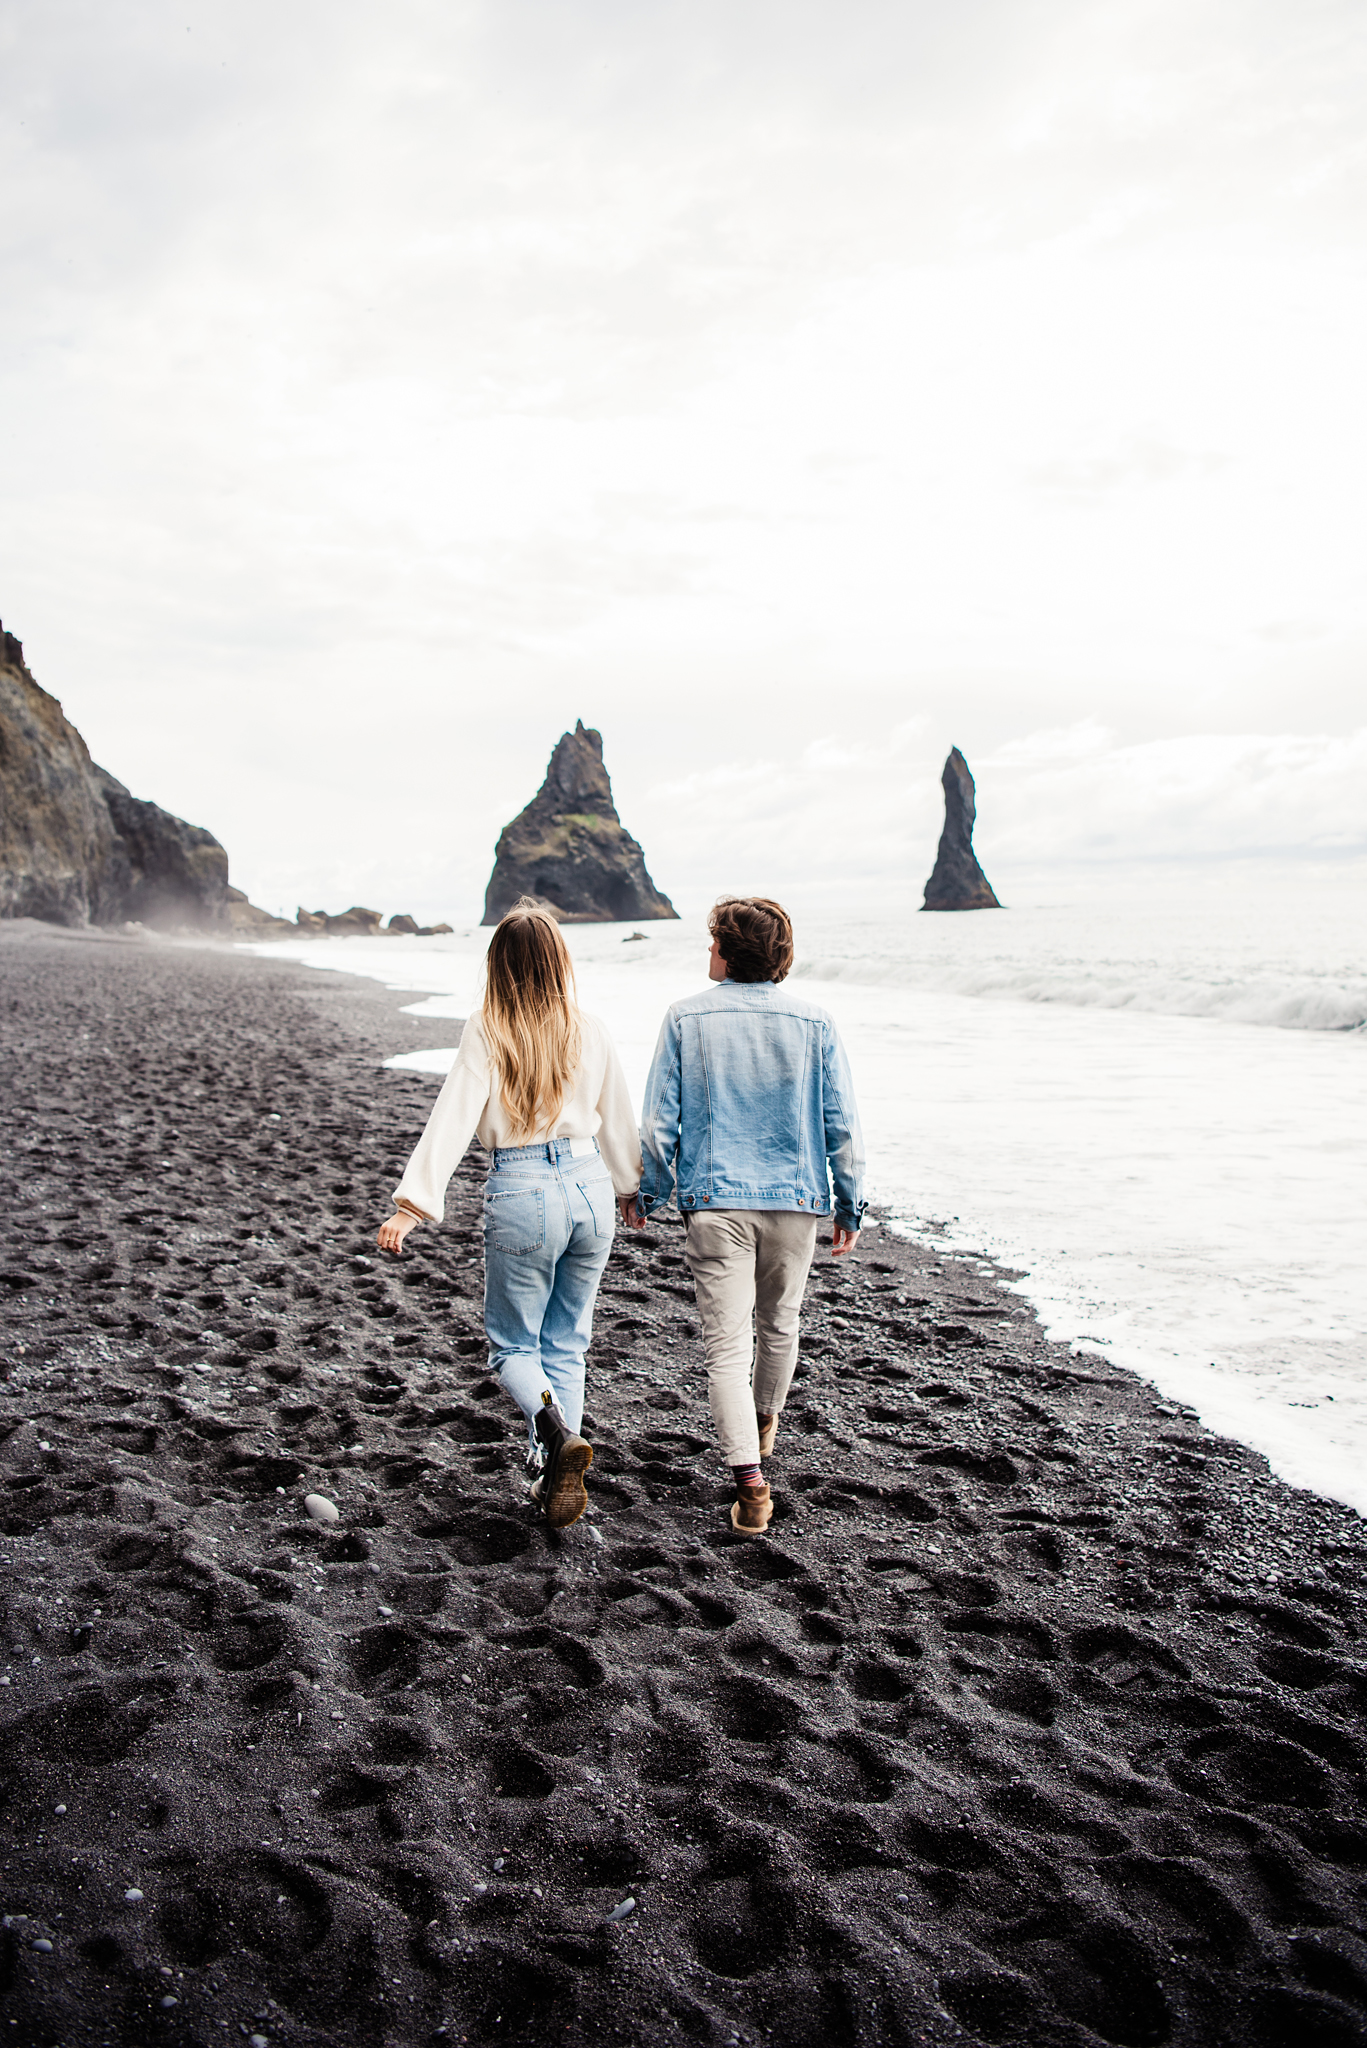 Iceland_Reynisfjara_Black_Sand_Beach_Couples_Session_JILL_STUDIO_Rochester_NY_Photographer_DSC_9775.jpg